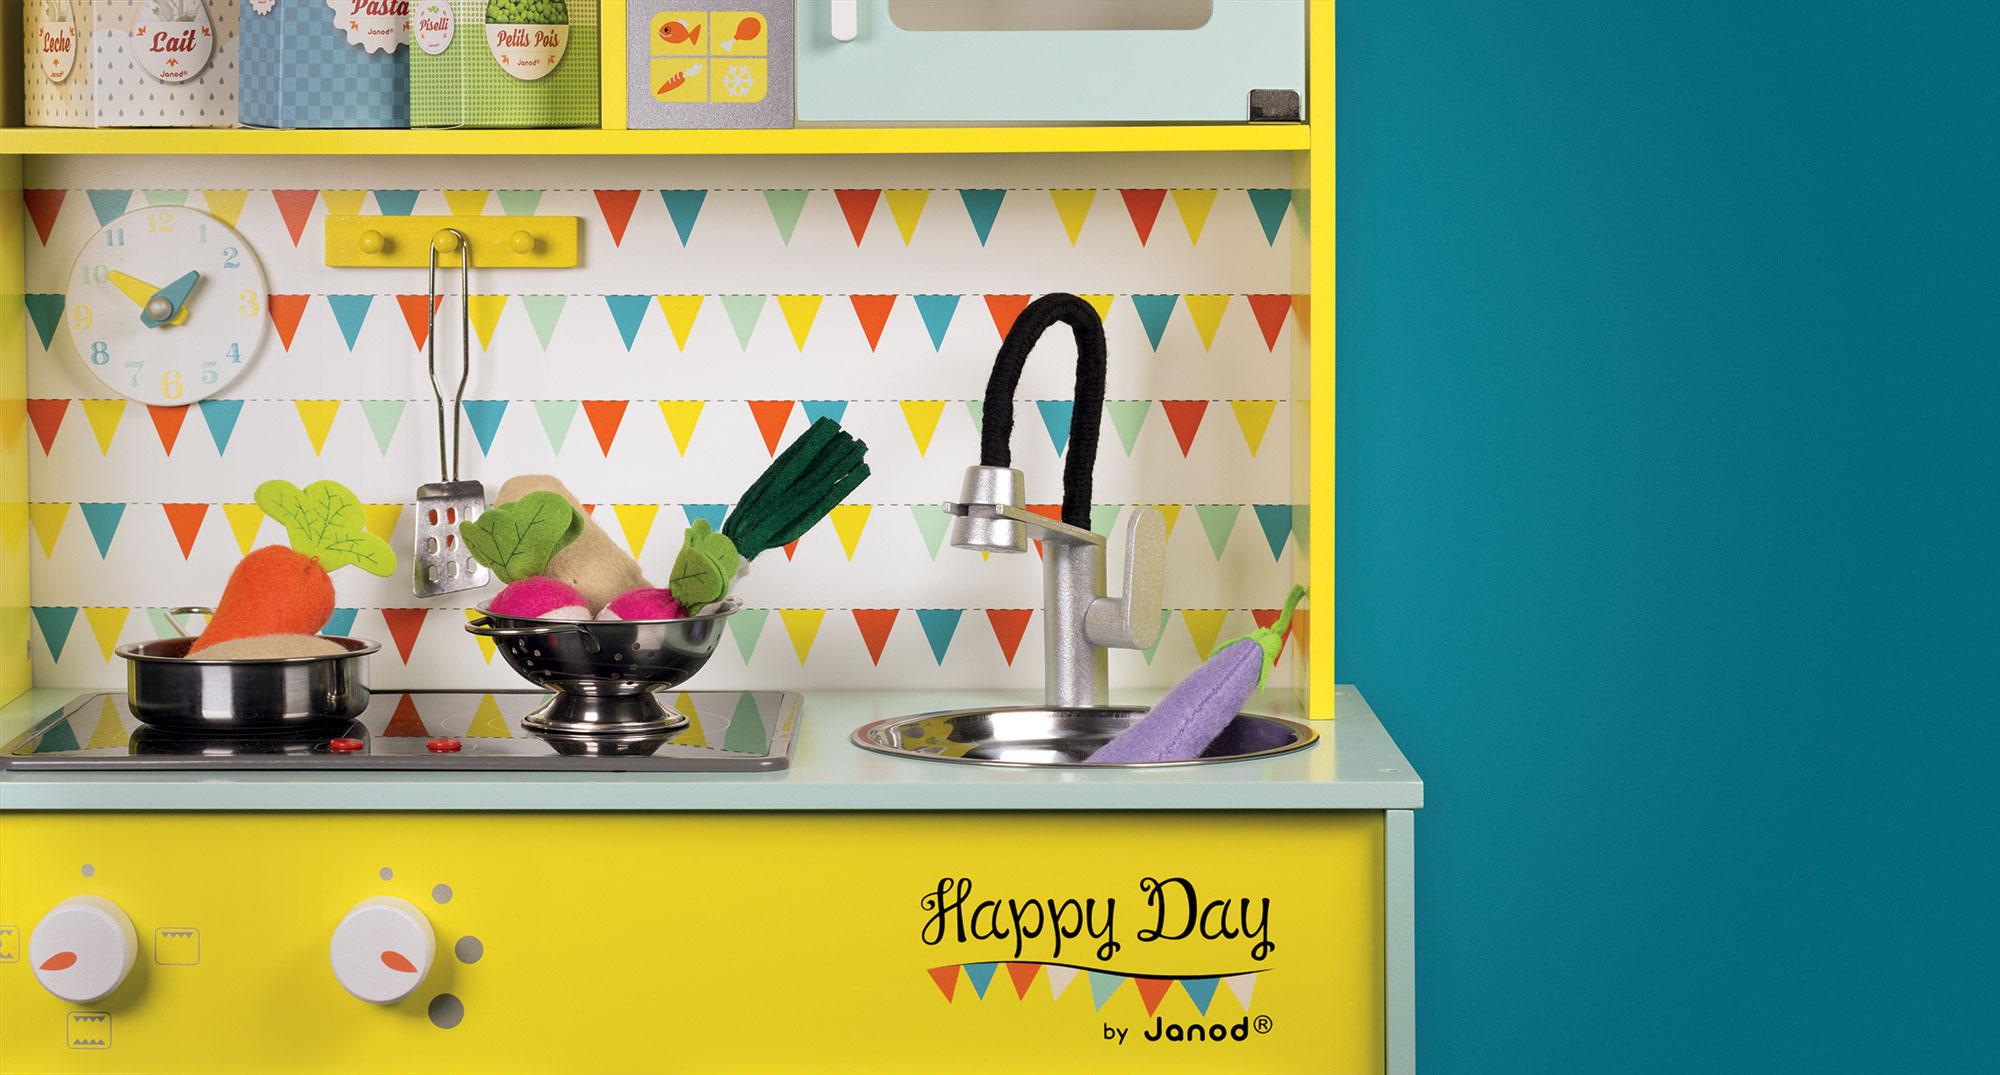 Janod elektronick d ev n kuchy ka happy day 06564 zeleno for Cuisine happy day janod